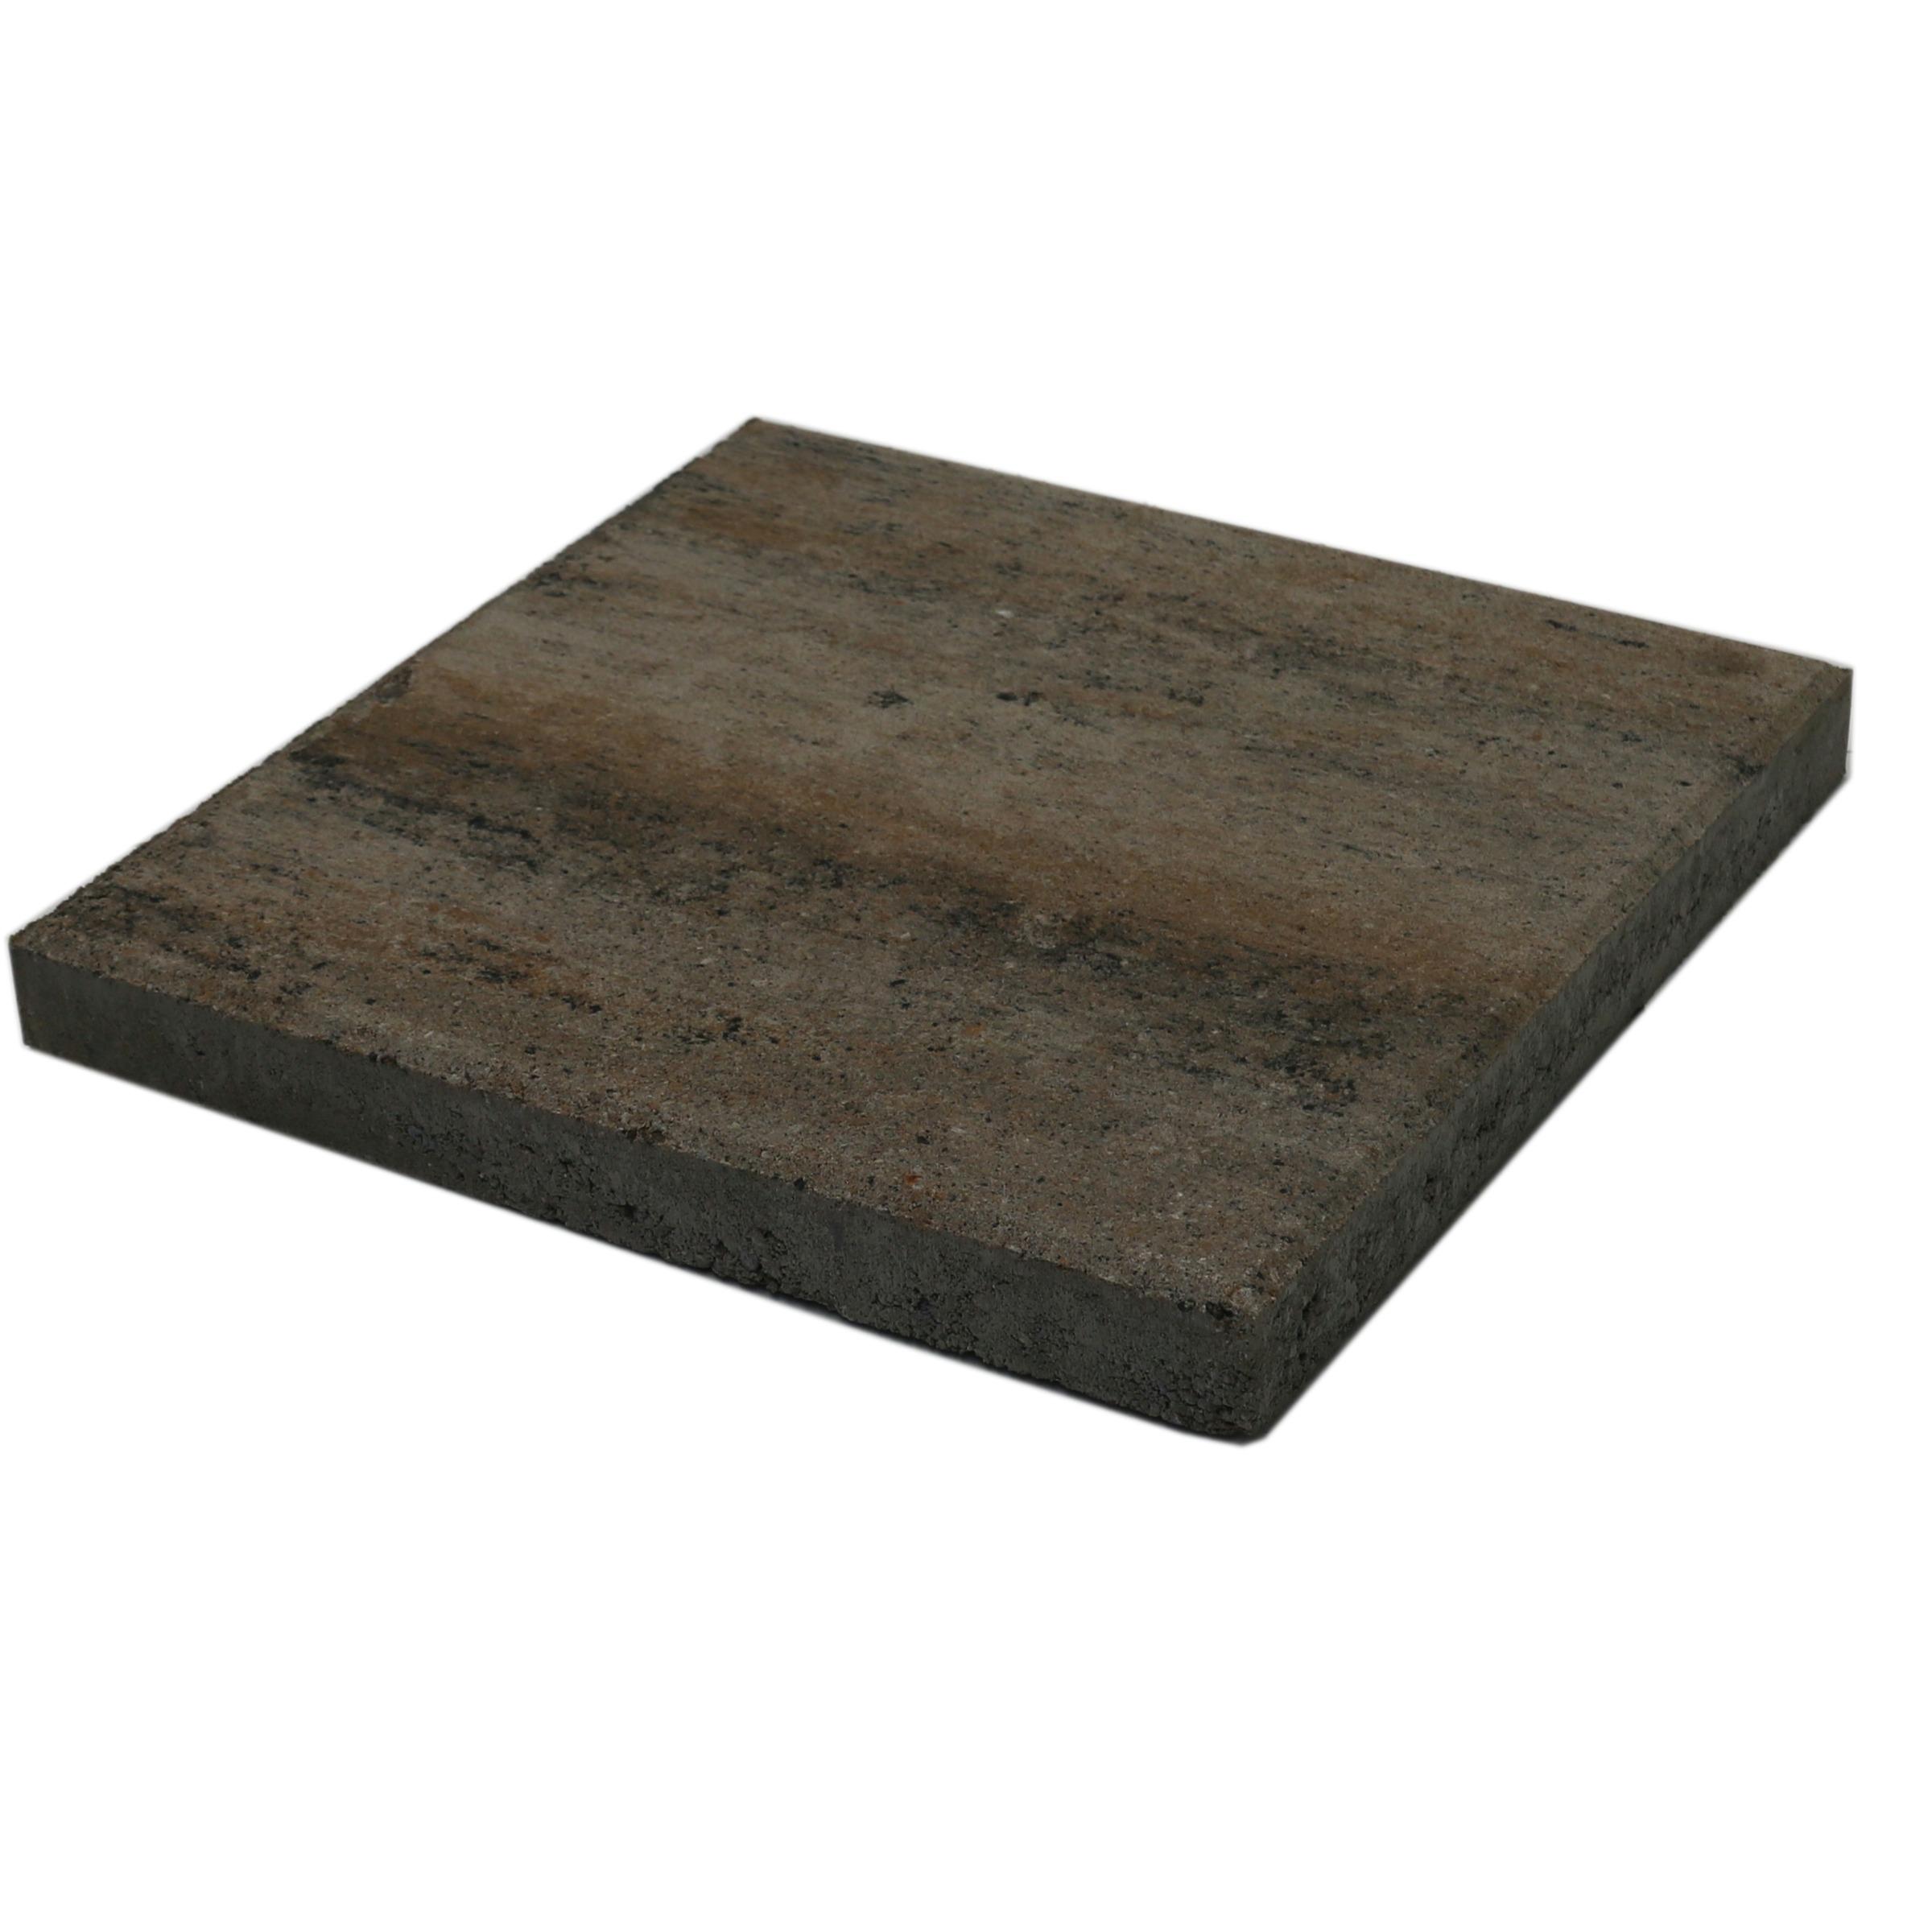 Terrastegel Beton Quadro Schelp Grijs/Bruin 40x40 cm - Per Tegel - 0,16 m2